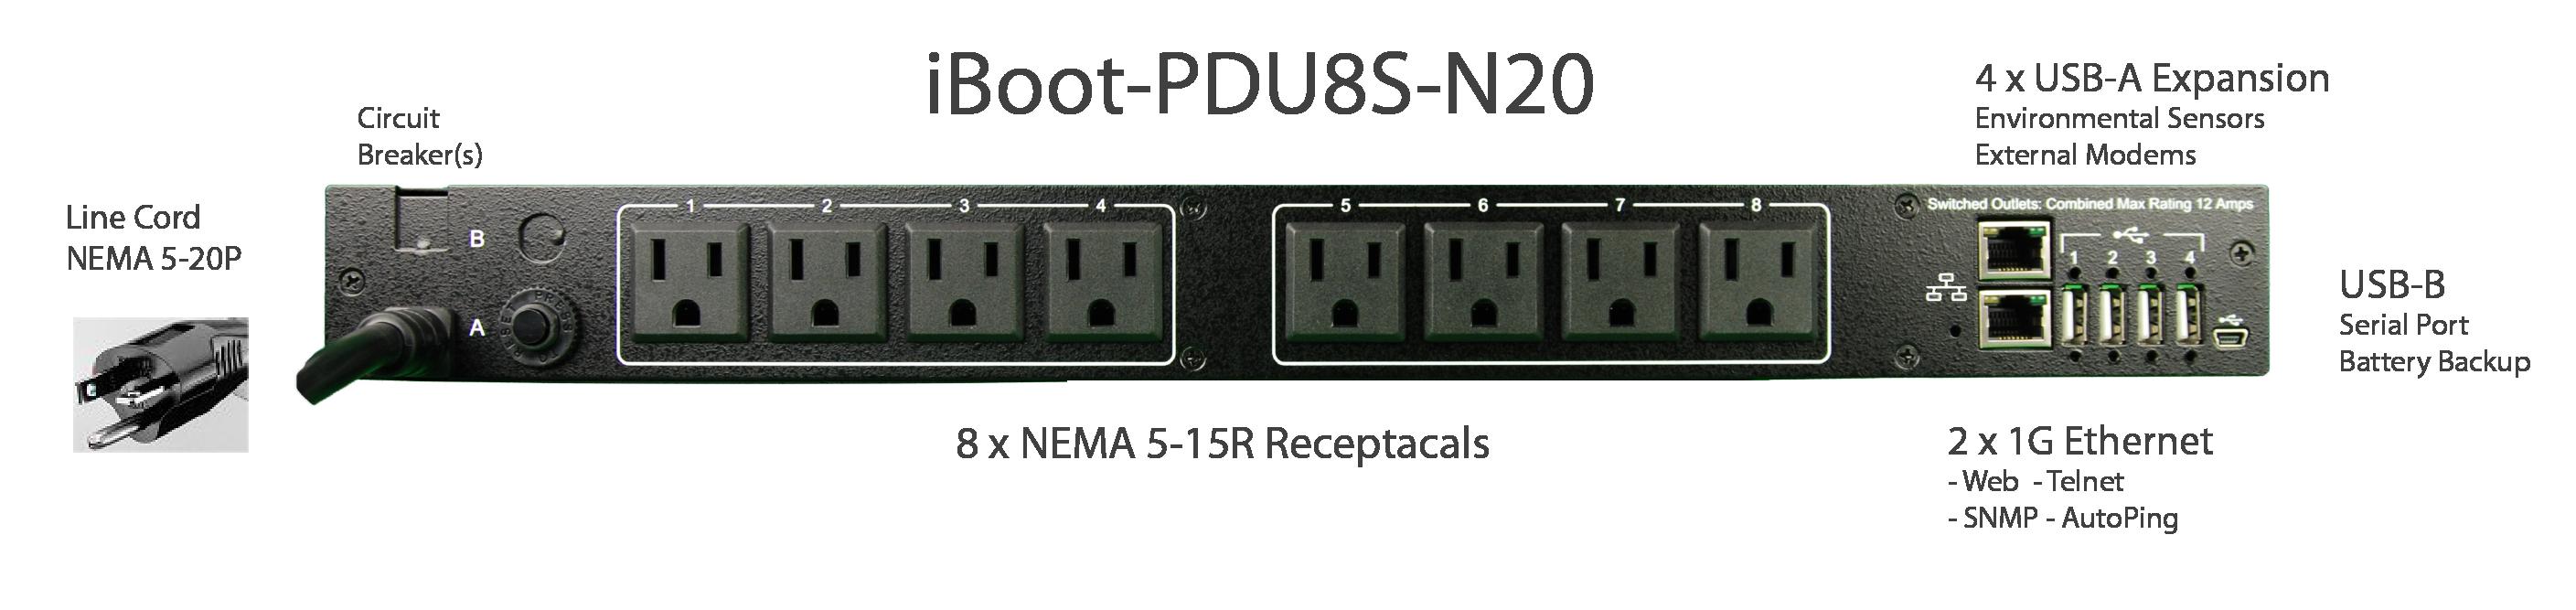 iBoot-PDU8S-N20 for Remote Reboot, 1 x NEMA 5-20P.